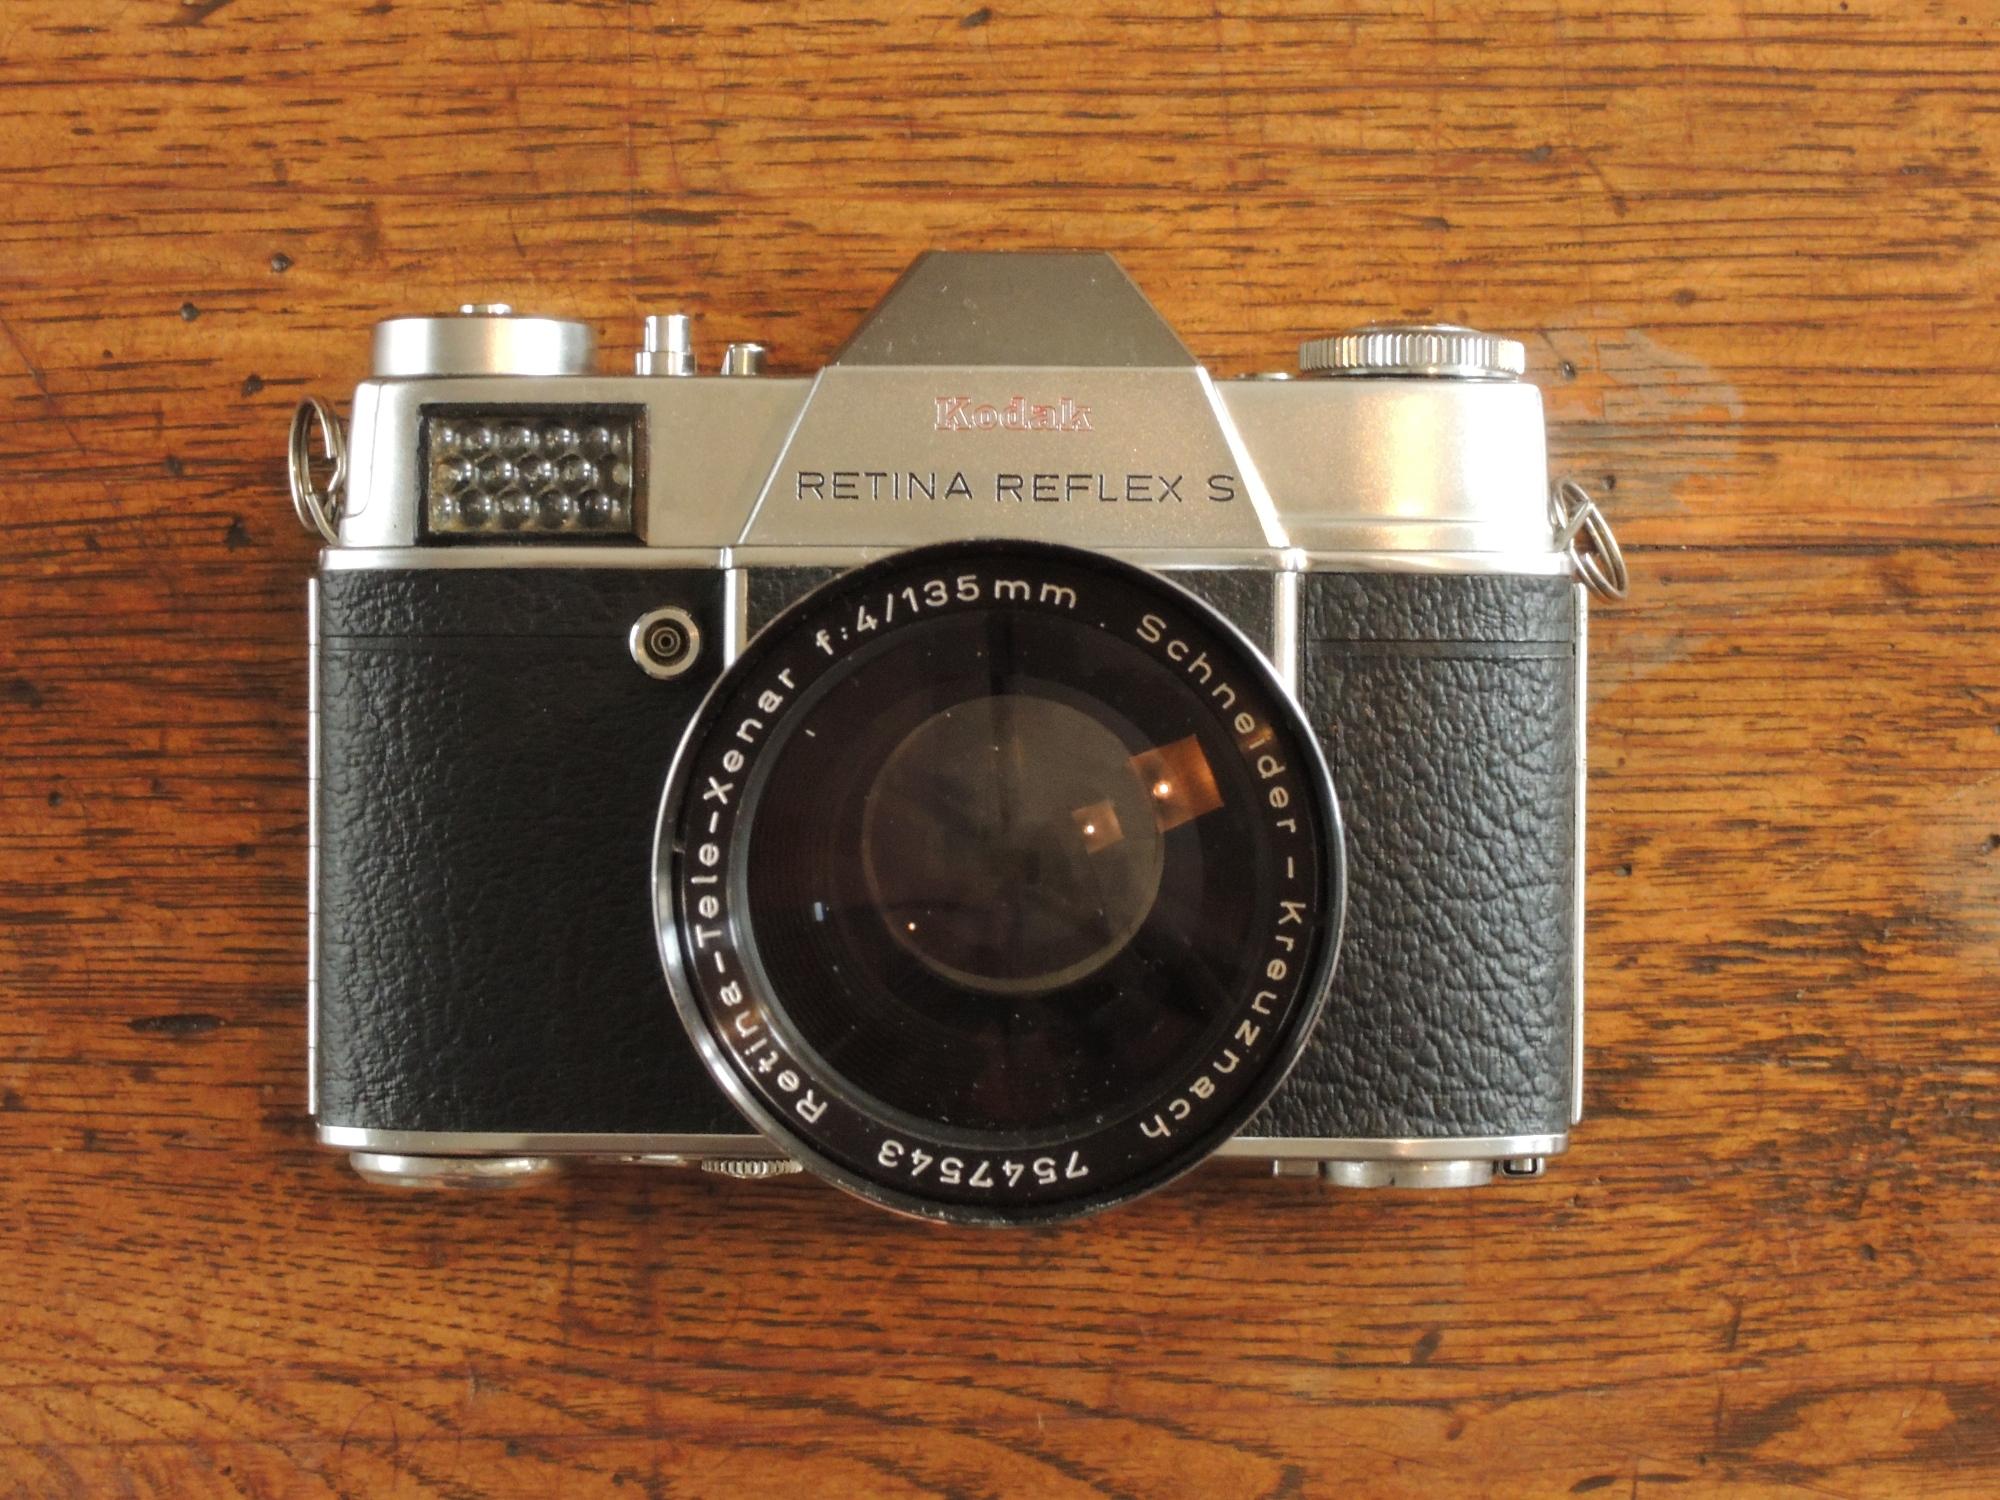 Kodak Retina Reflex S front 4/135